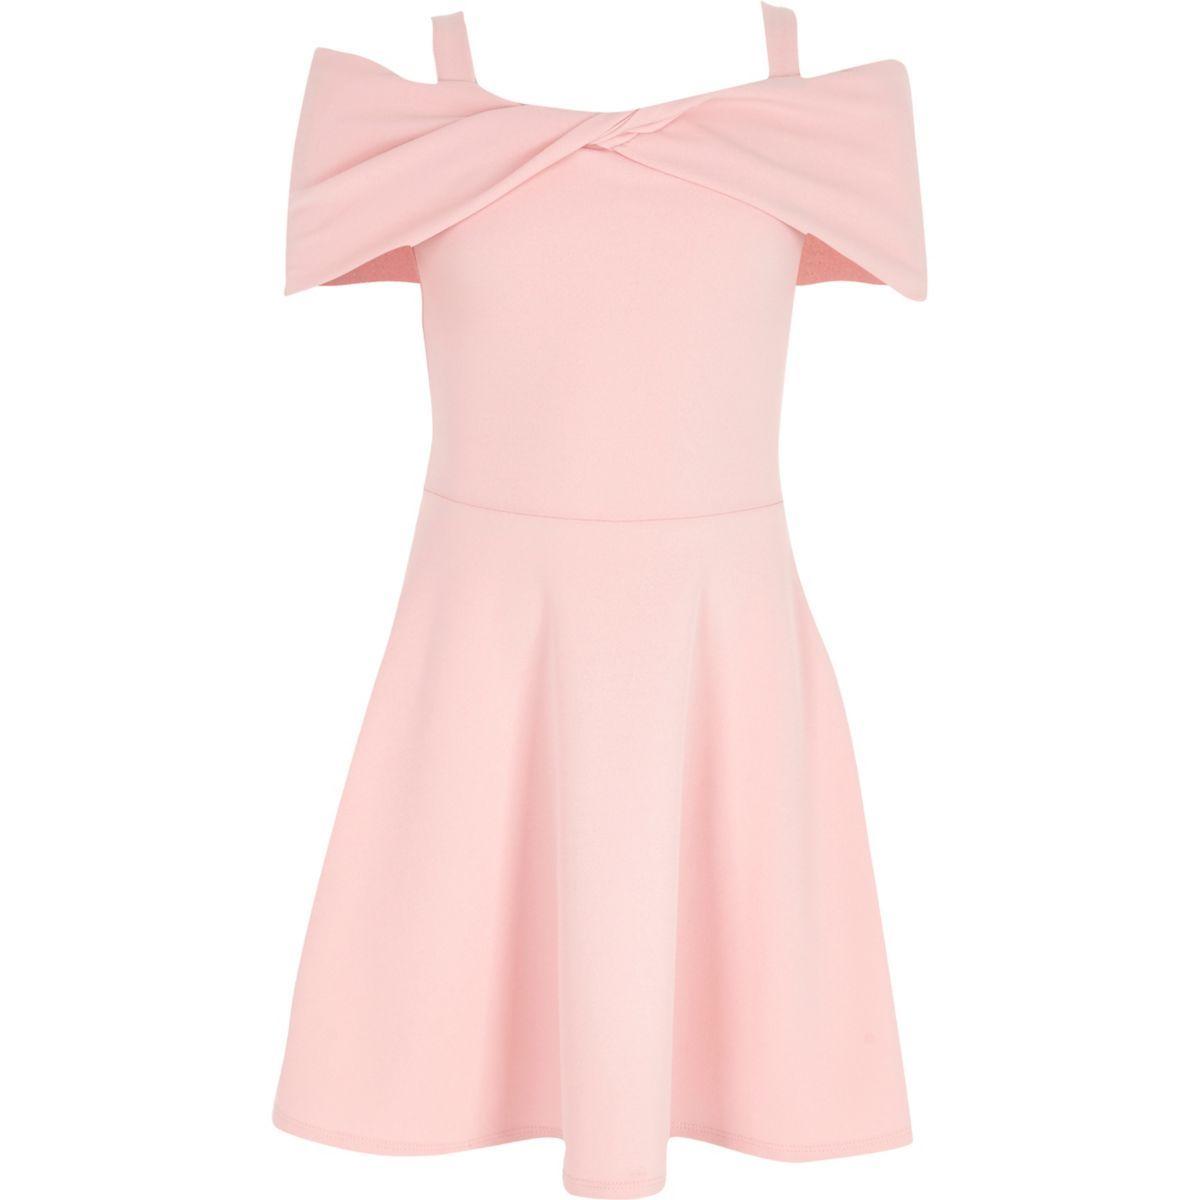 Girls Pink Scuba Bow Bardot Skater Dress Party Dresses Dresses Girls Girls Graduation Dresses Dresses For Tweens Girls Formal Dresses [ 1200 x 1200 Pixel ]